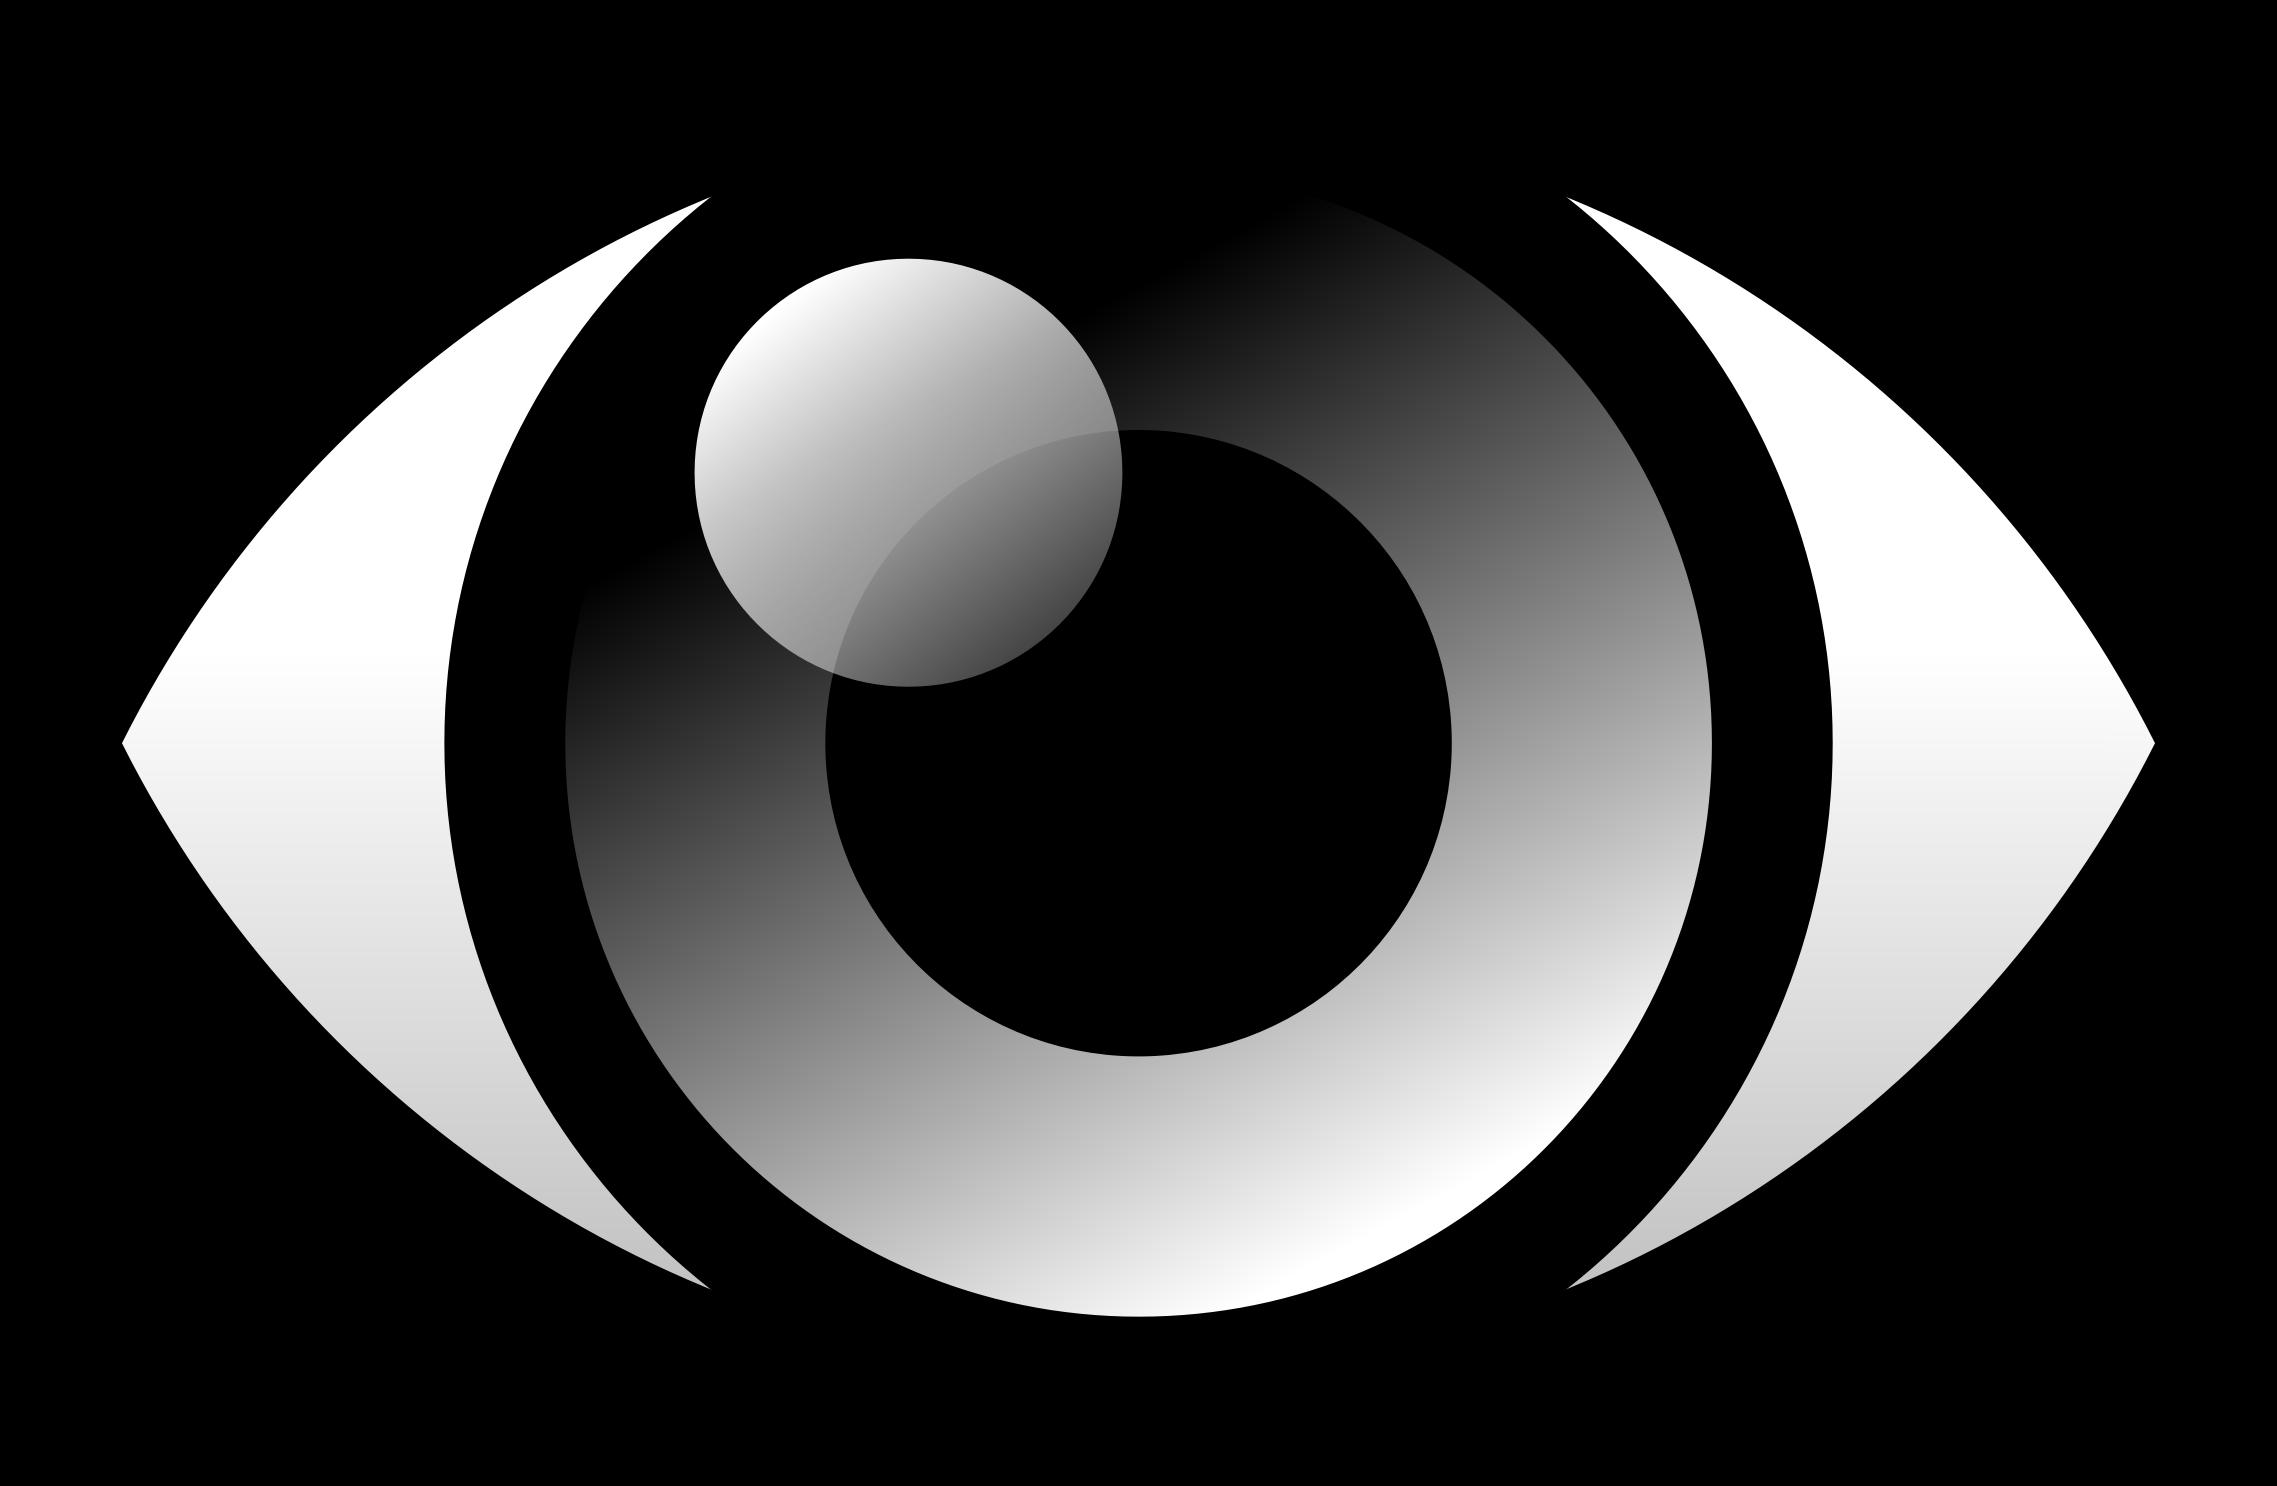 Clipart ear icon. Eye